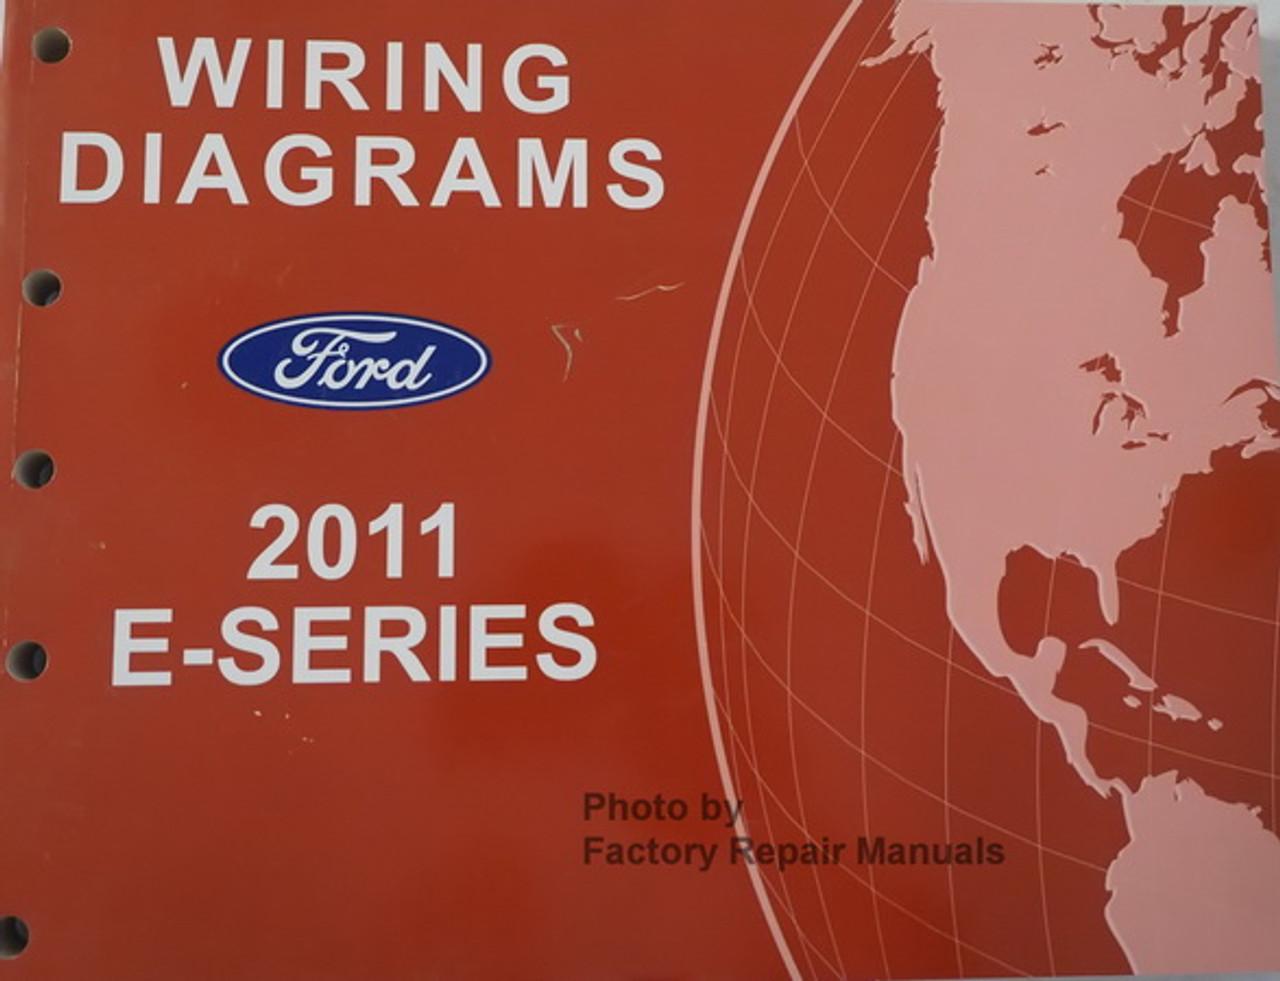 2011 ford e150 e250 e350 e450 electrical wiring diagrams manual original -  factory repair manuals  factory repair manuals